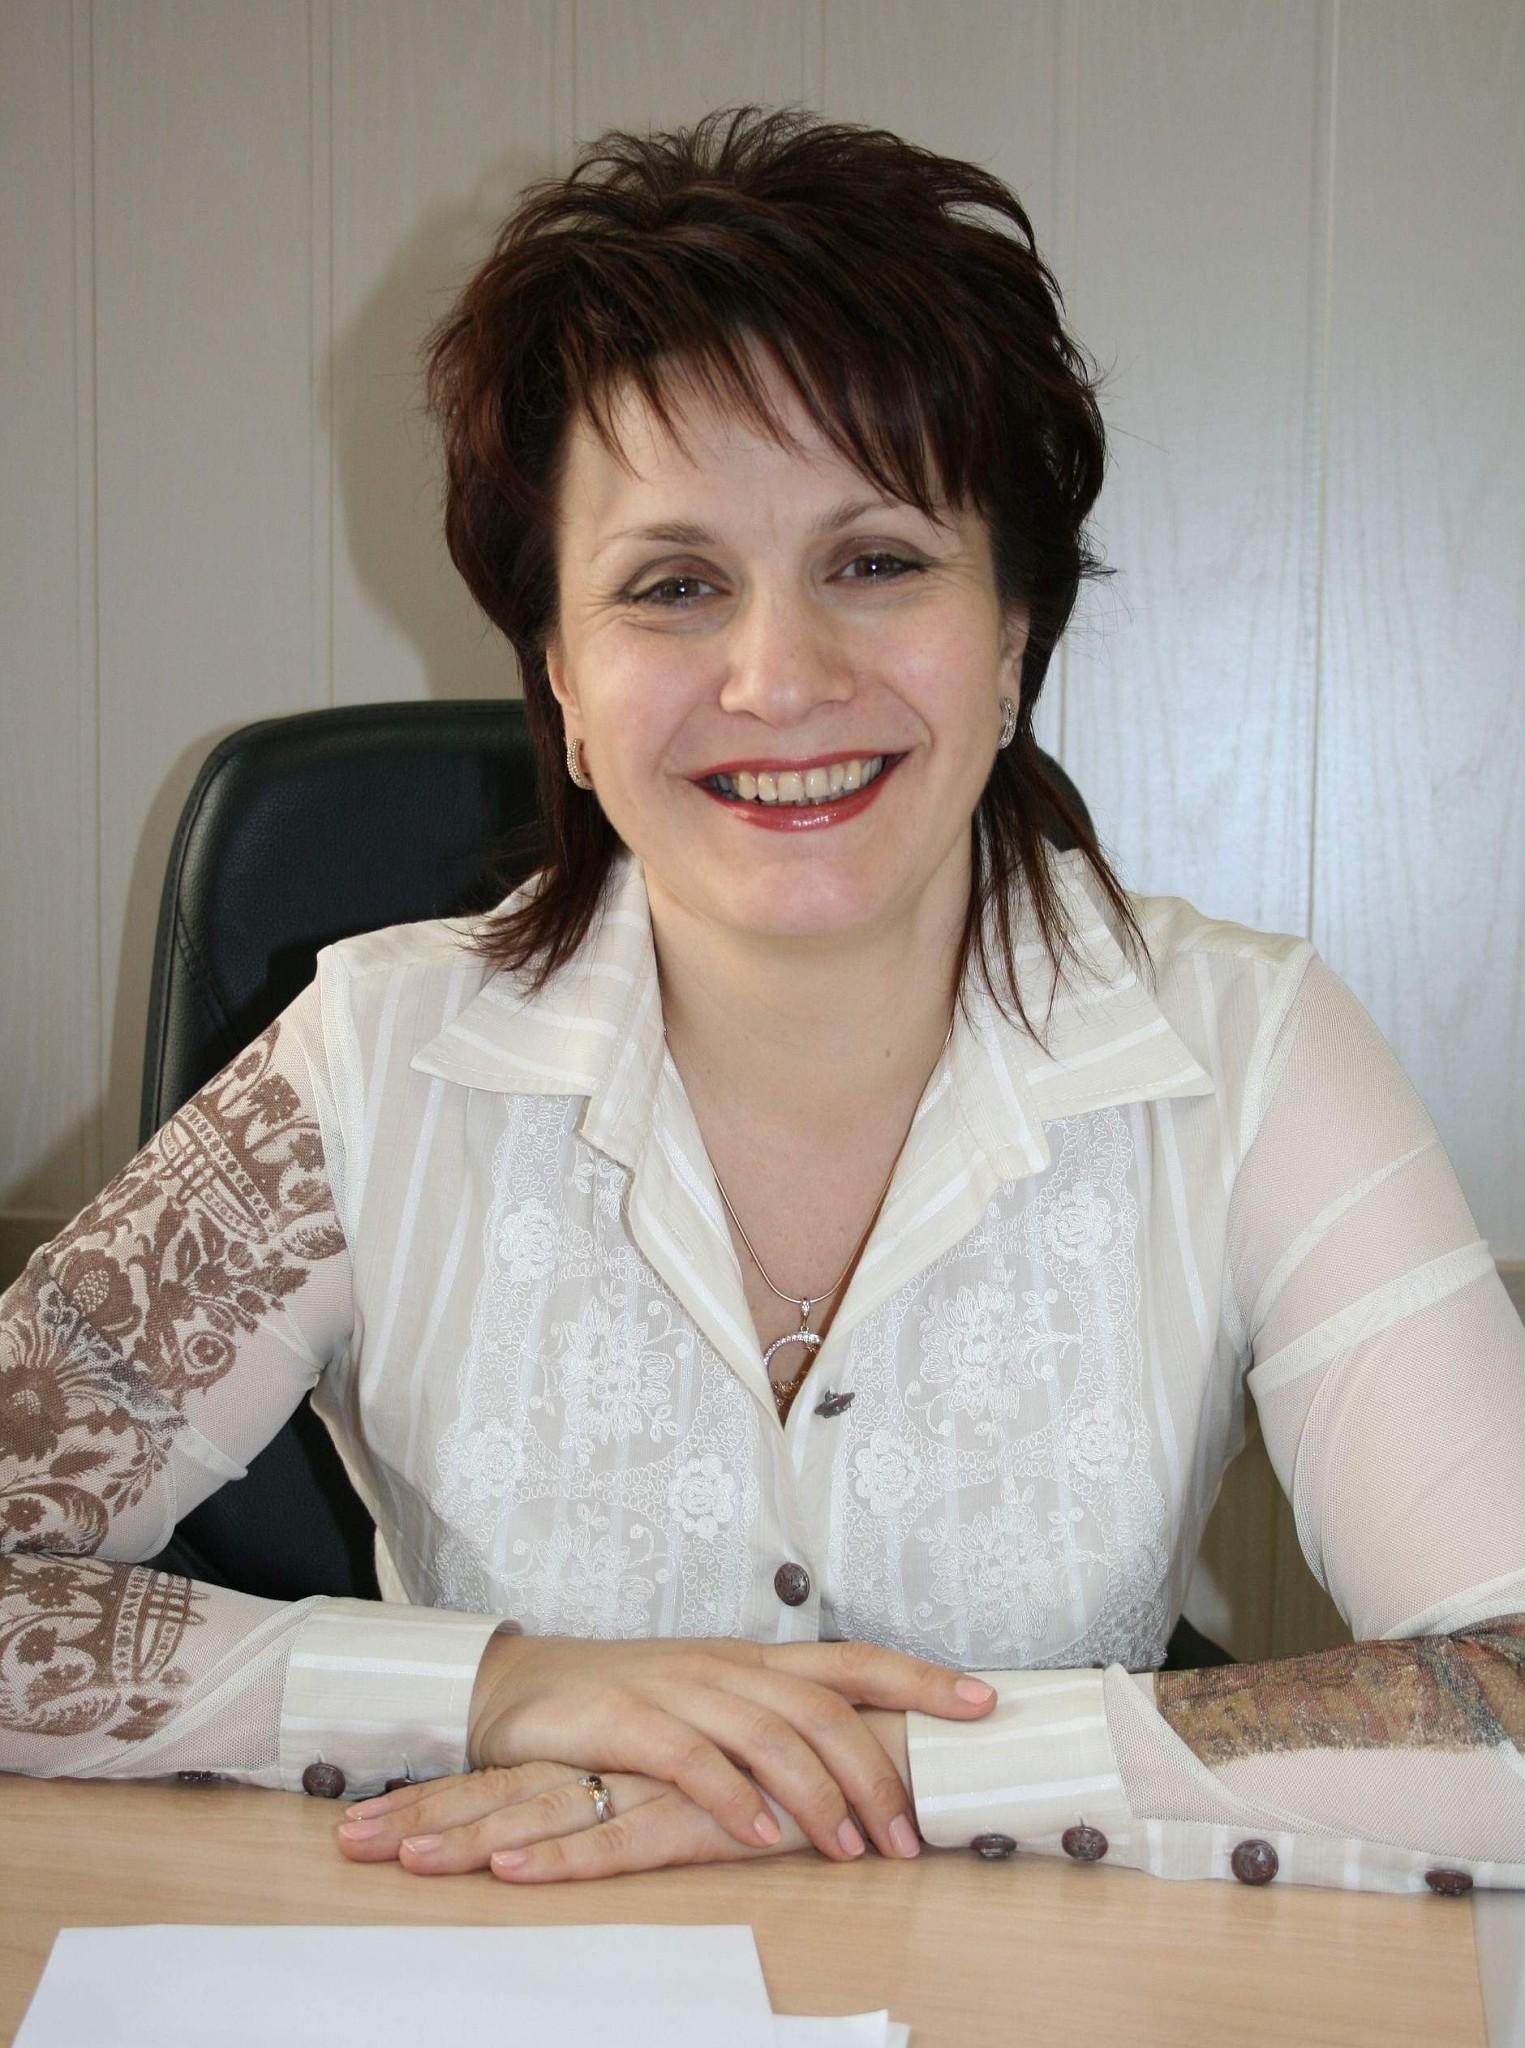 Irina Anatolyevna Tropina